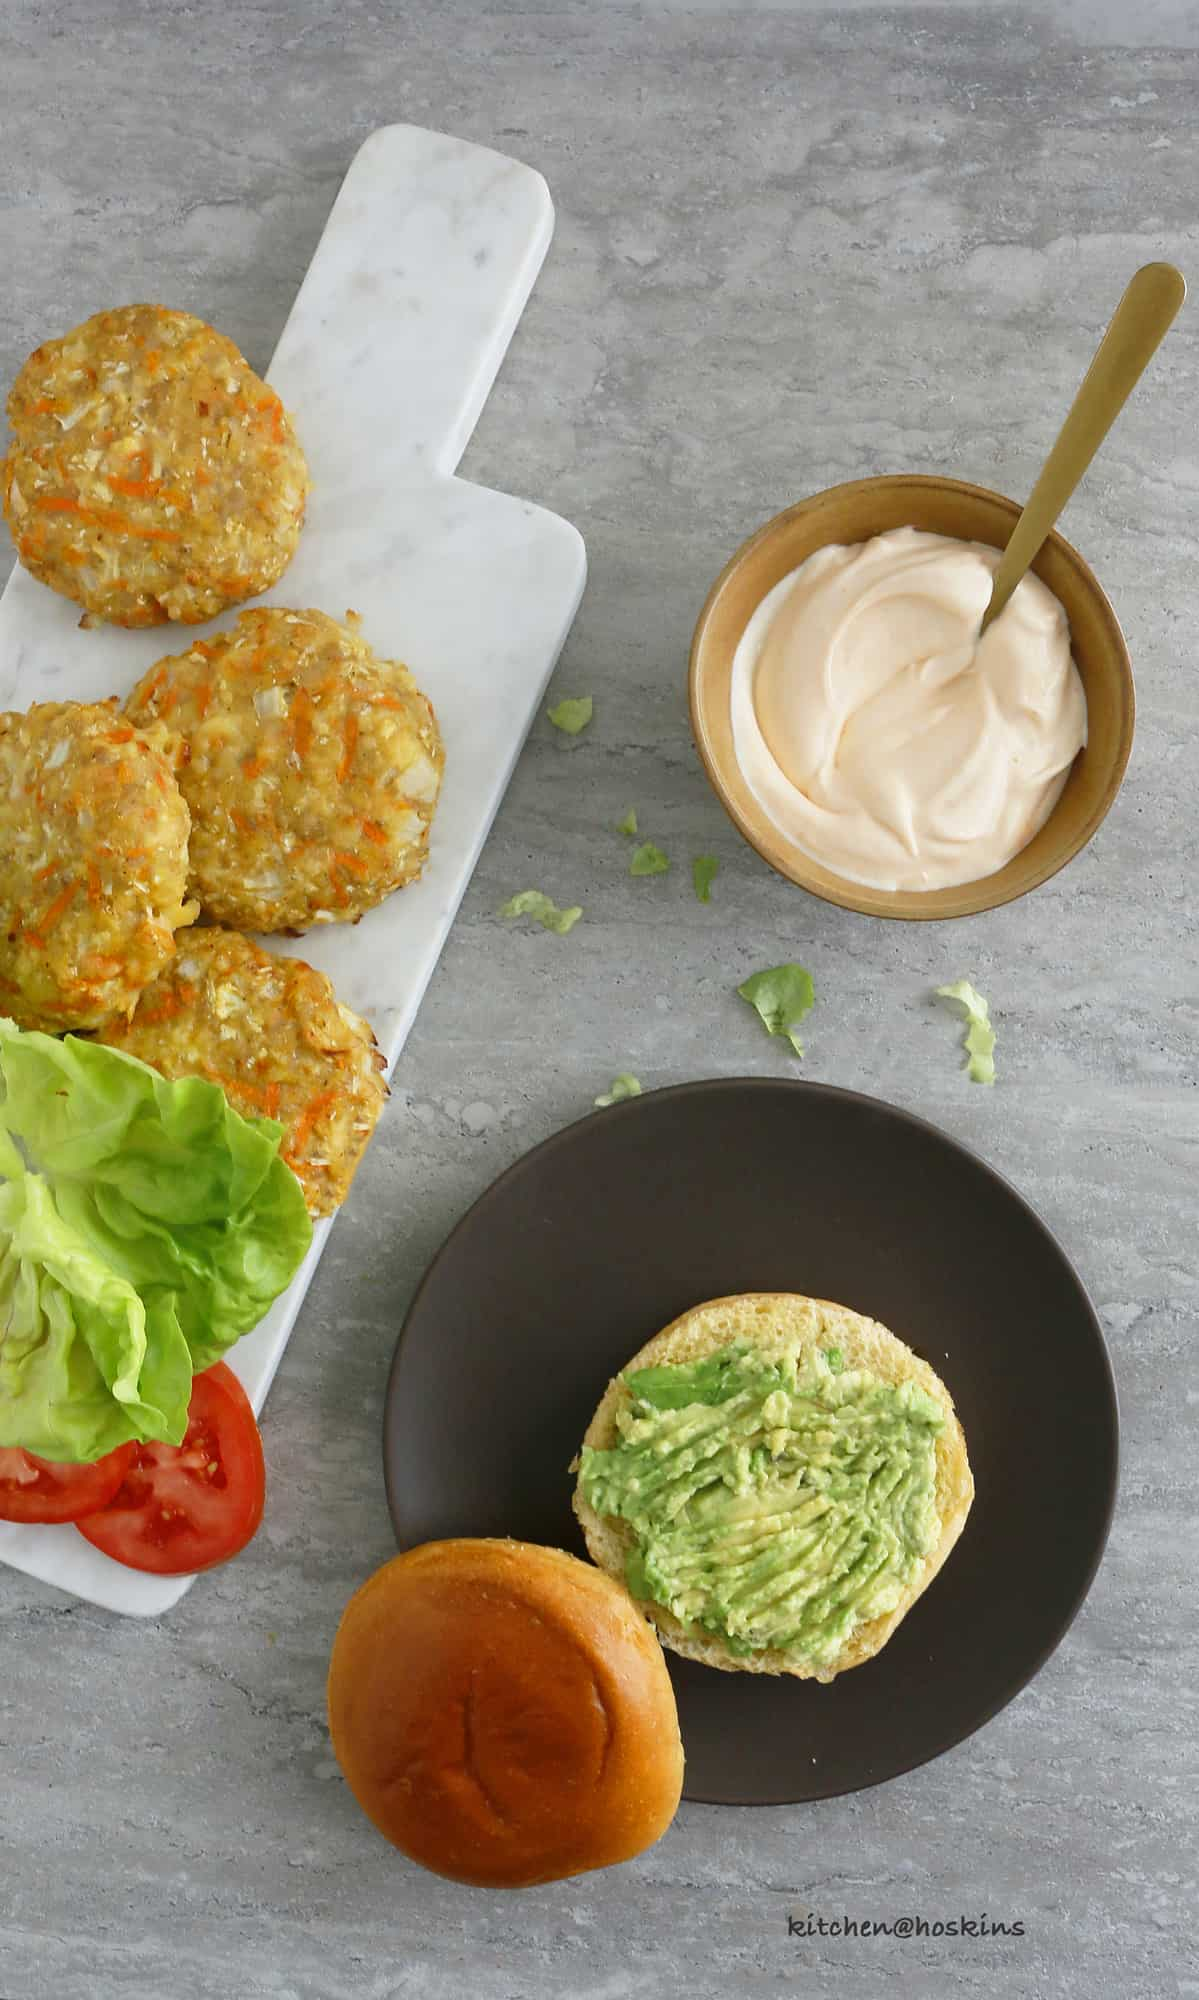 healthy chicken burger patties, mashed avocado, lettuce, tomato and sriracha mayo ready to assembled.